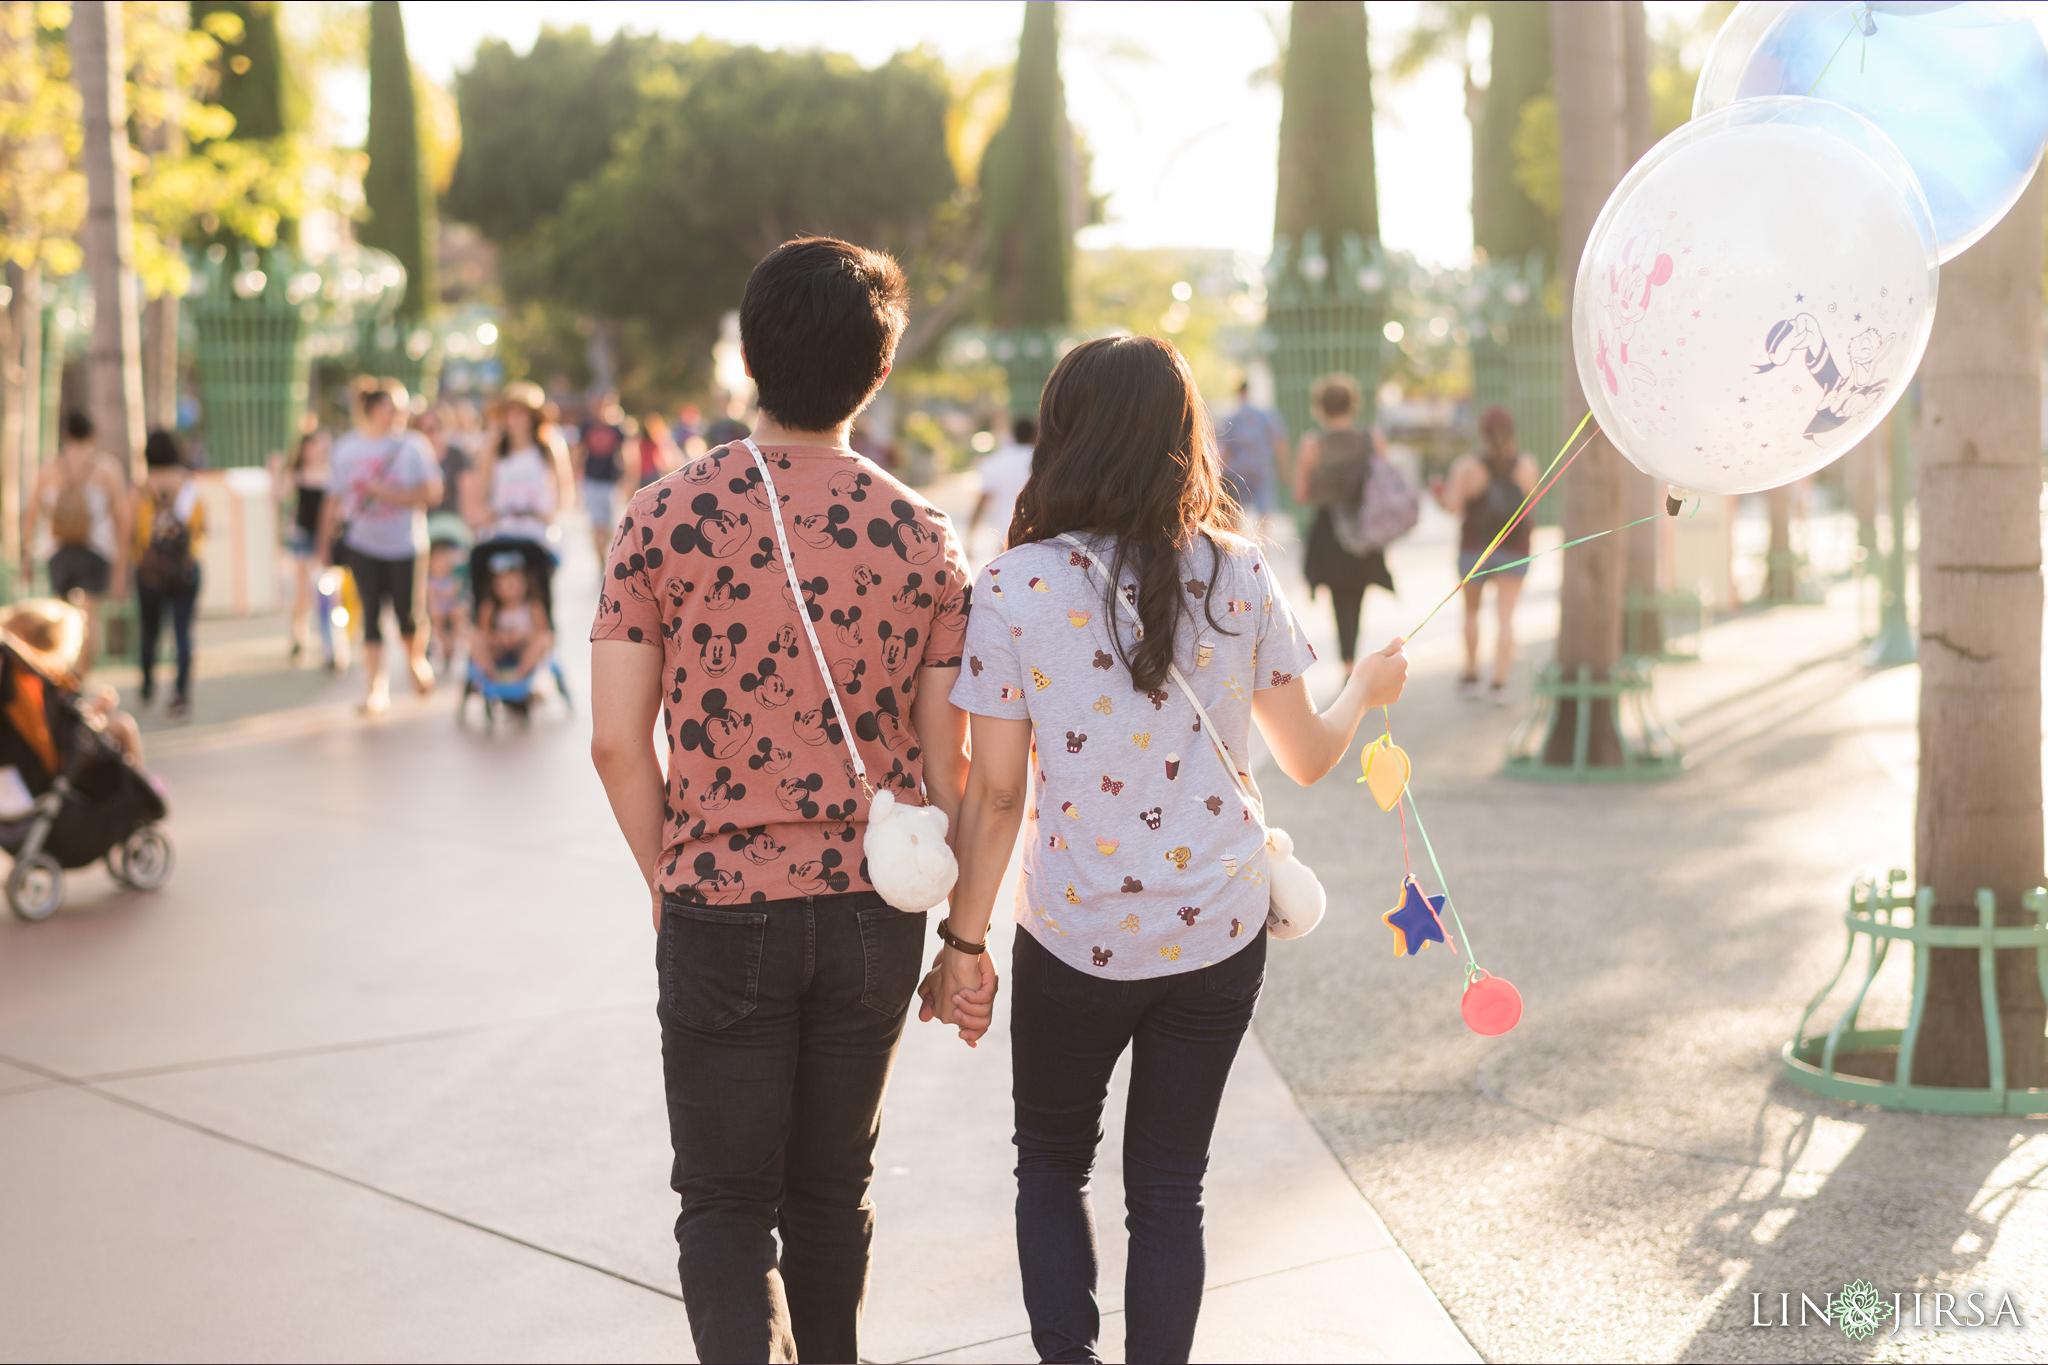 012 Downtown Disney Anaheim Engagement Photography